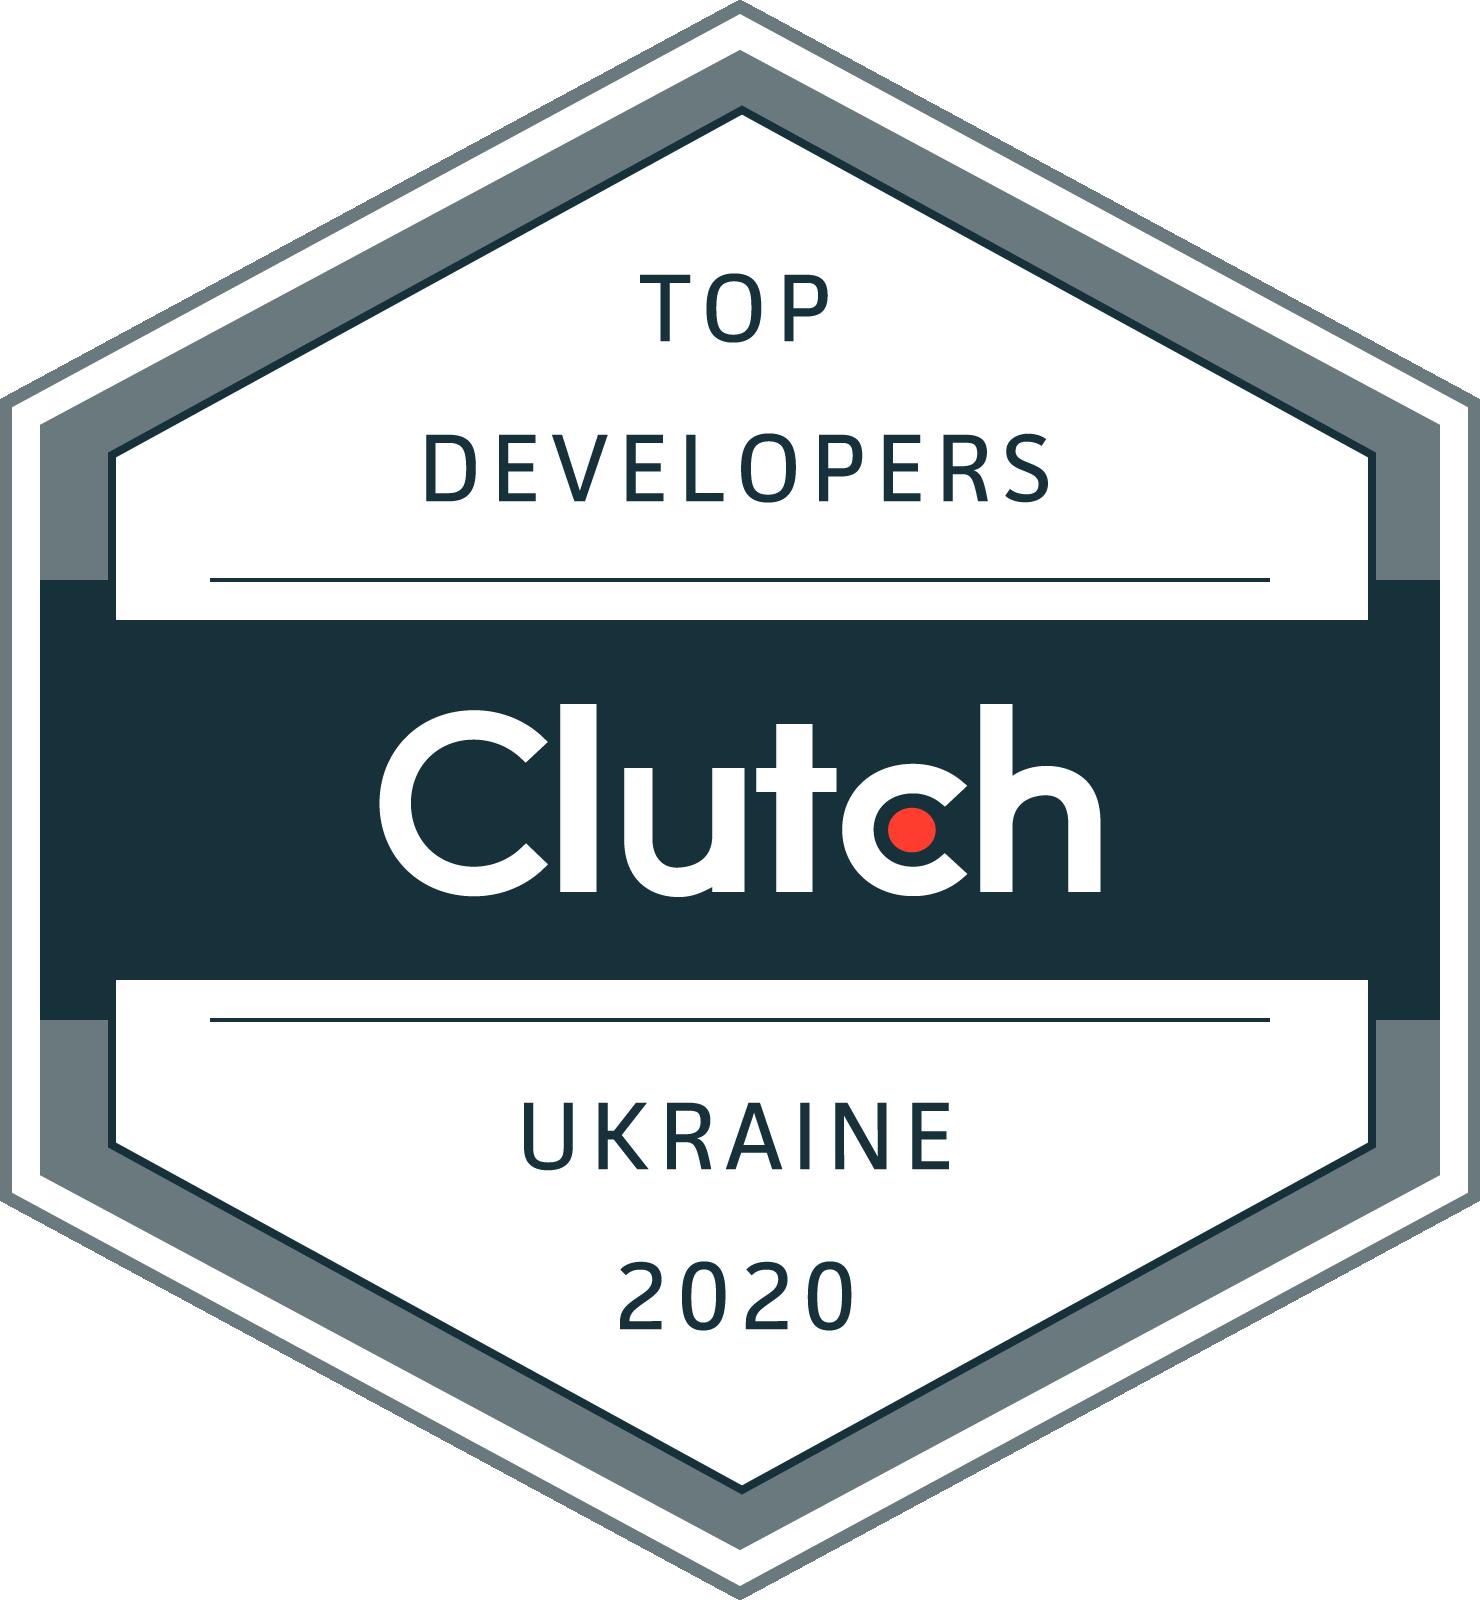 Clutch bage of Top developers in Ukraine 2020 for F5 Studio web agency